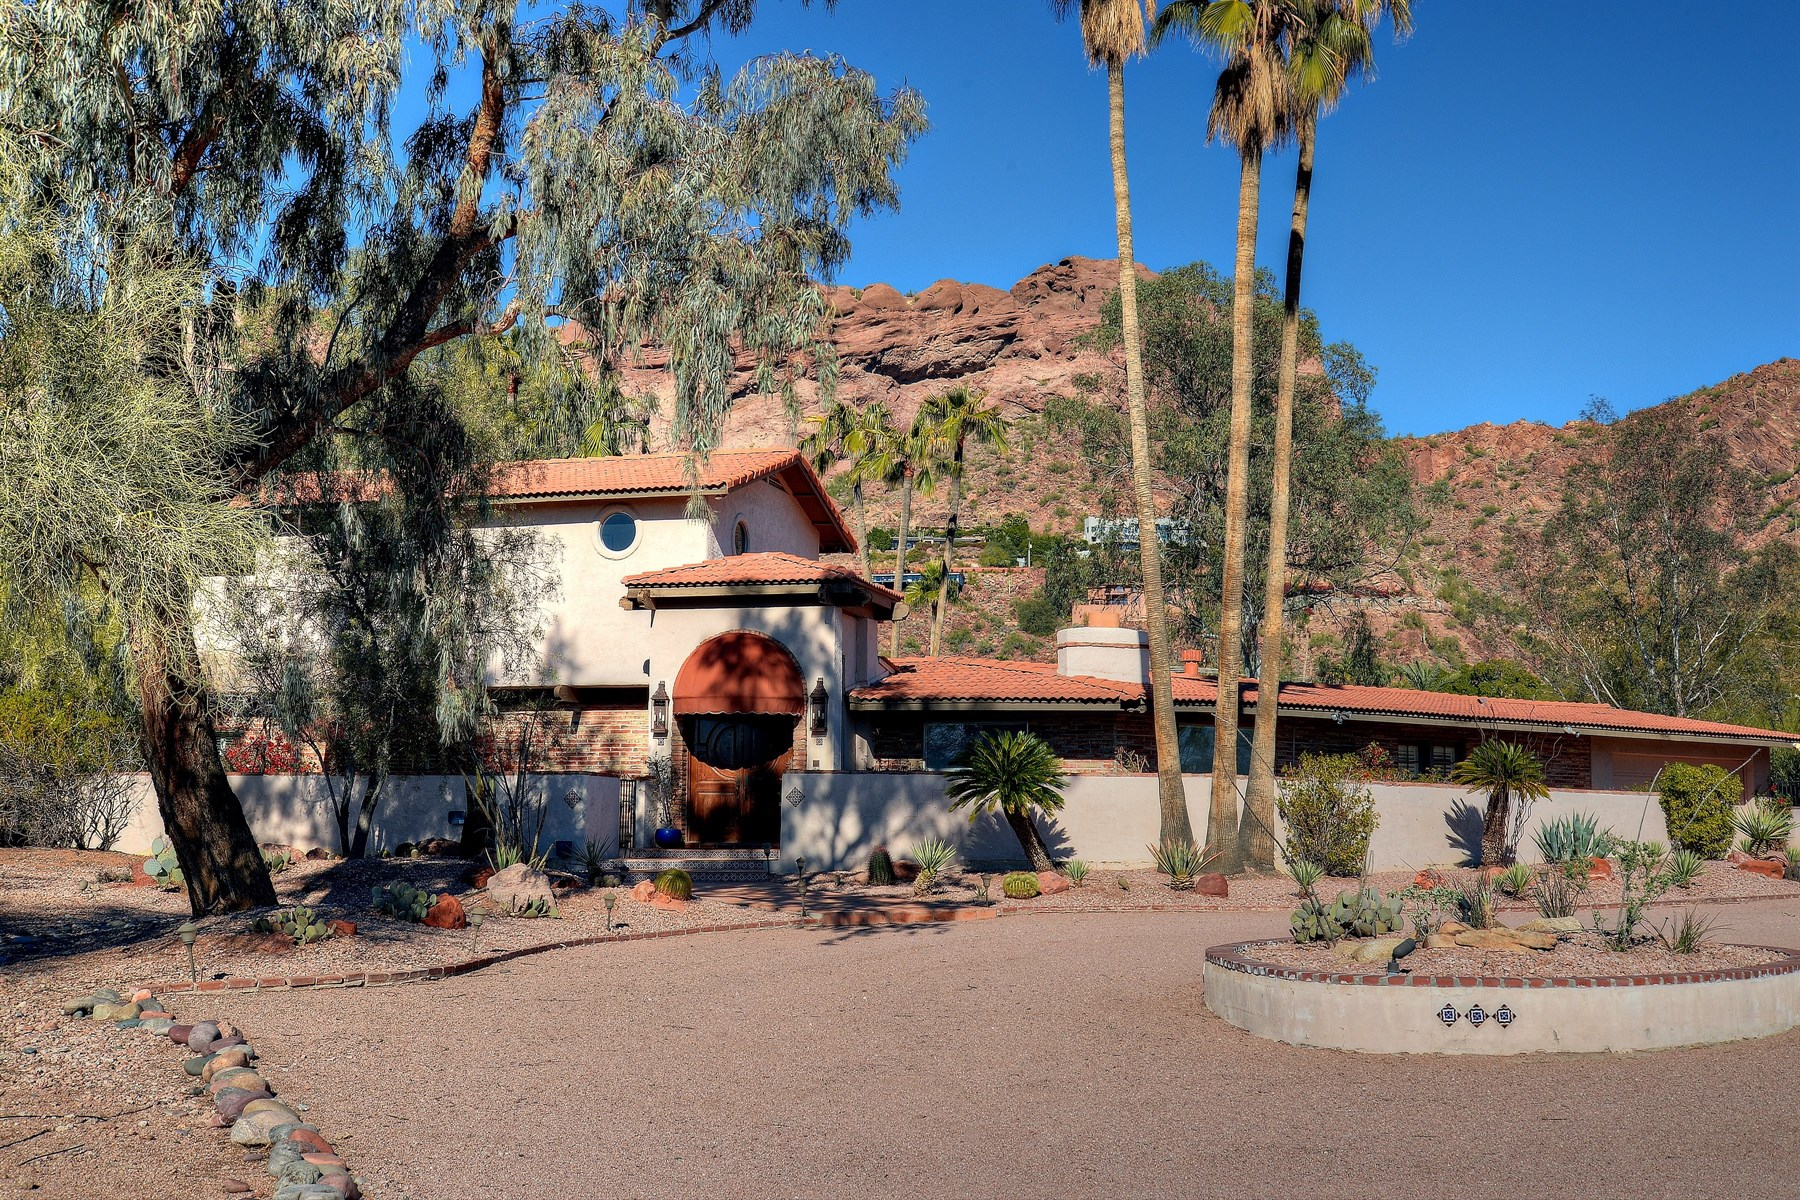 Casa Unifamiliar por un Venta en A truly wonderful home and lot that is all about the views 4950 E Rockridge Rd Phoenix, Arizona 85018 Estados Unidos